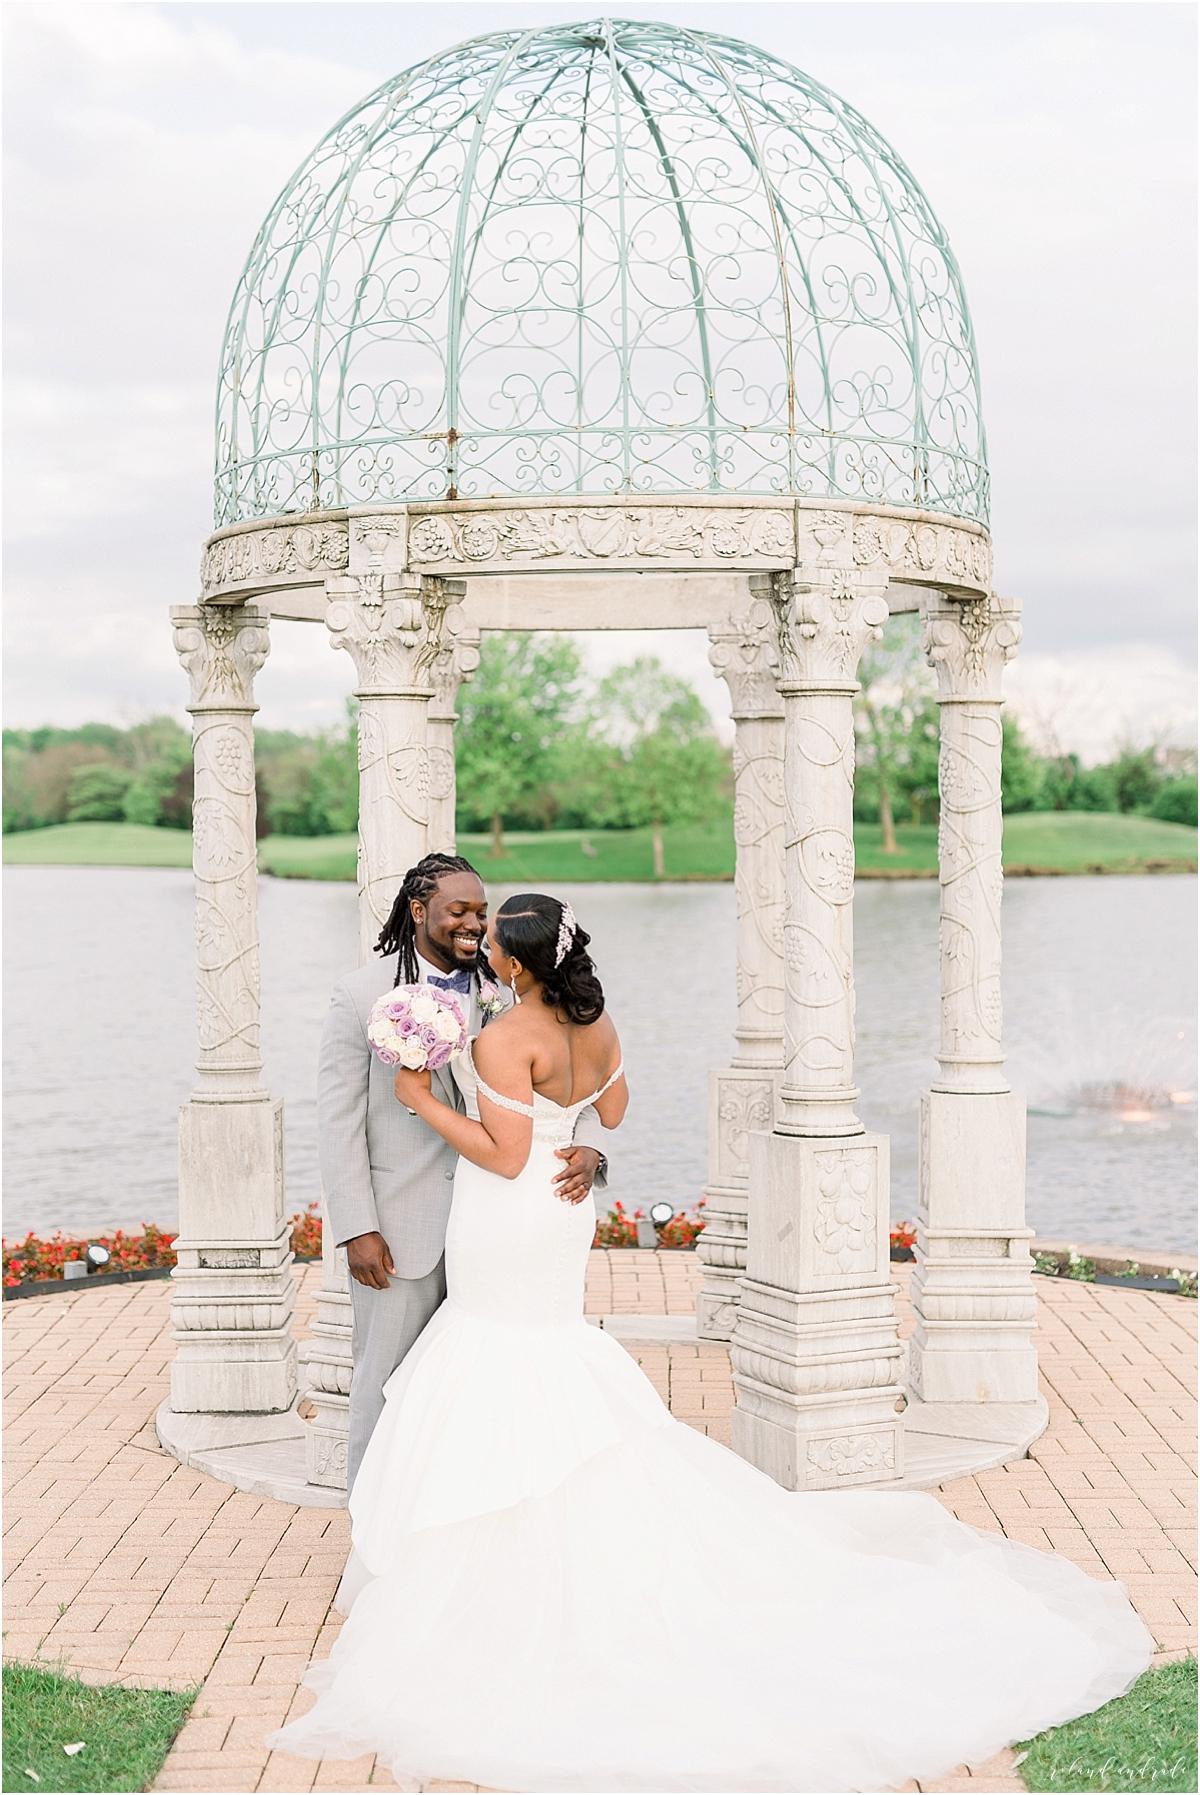 The Odyssey Wedding, Tinley Park Wedding, Chicago Wedding Photographer, Best Photographer In Tineley Park, Best Photographer In Chicago, Light And Airy Photographer_0062.jpg